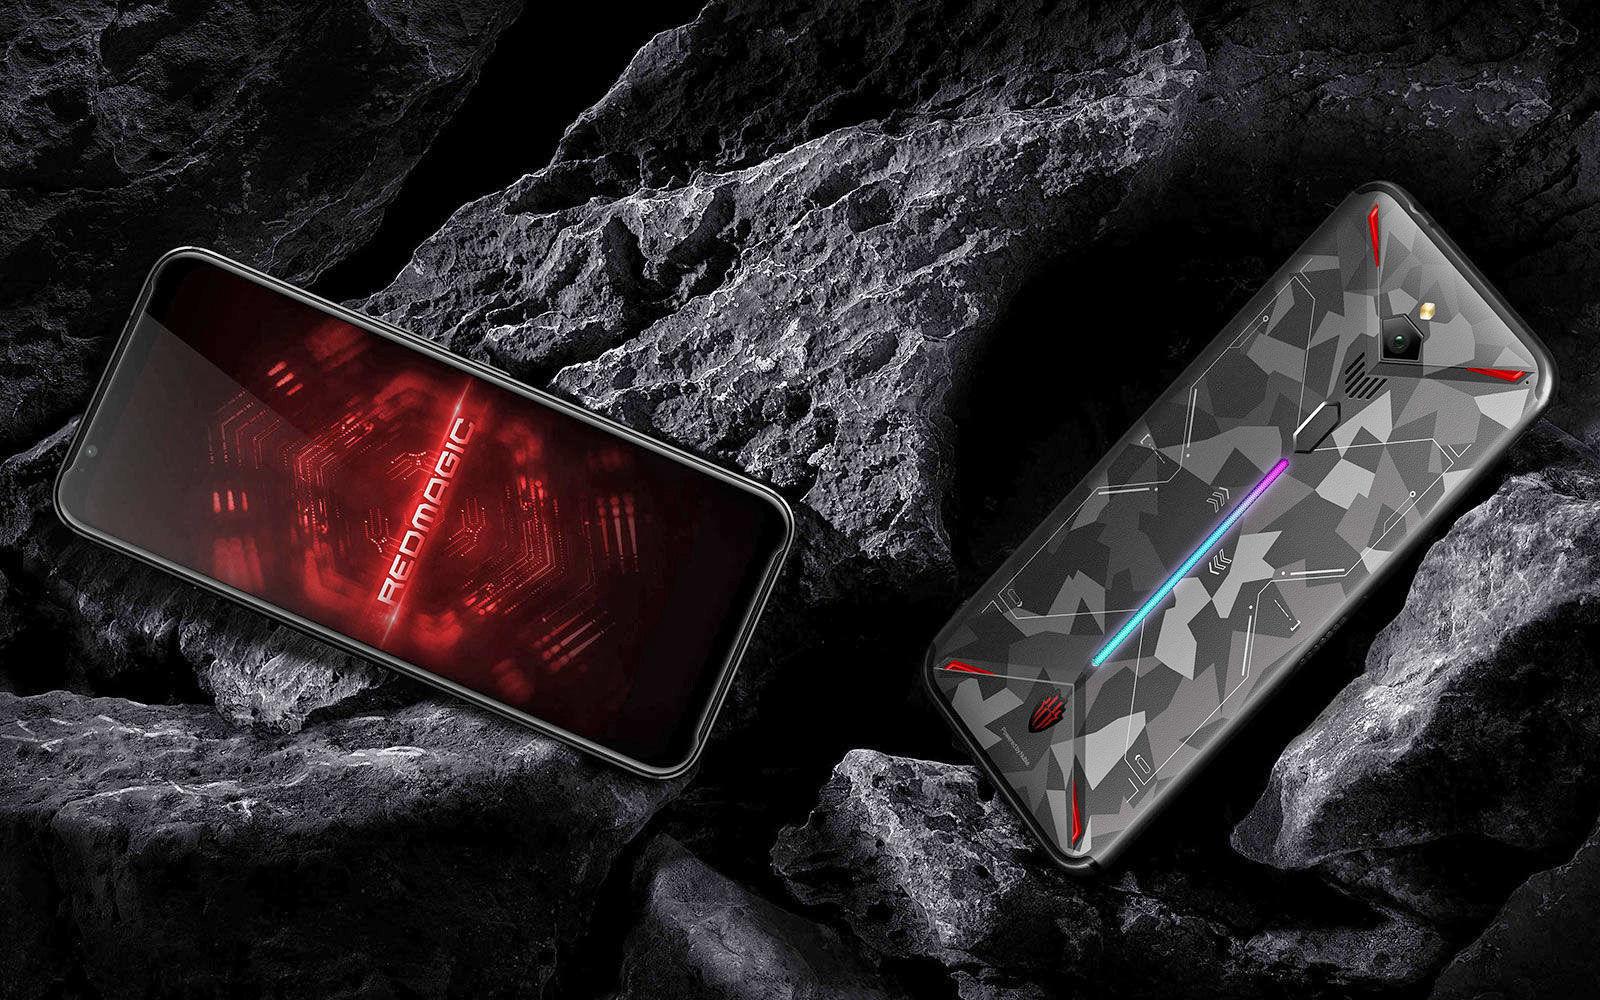 L'escalade : un smartphone gaming avec ventilateur et enregistrement video 8K 1